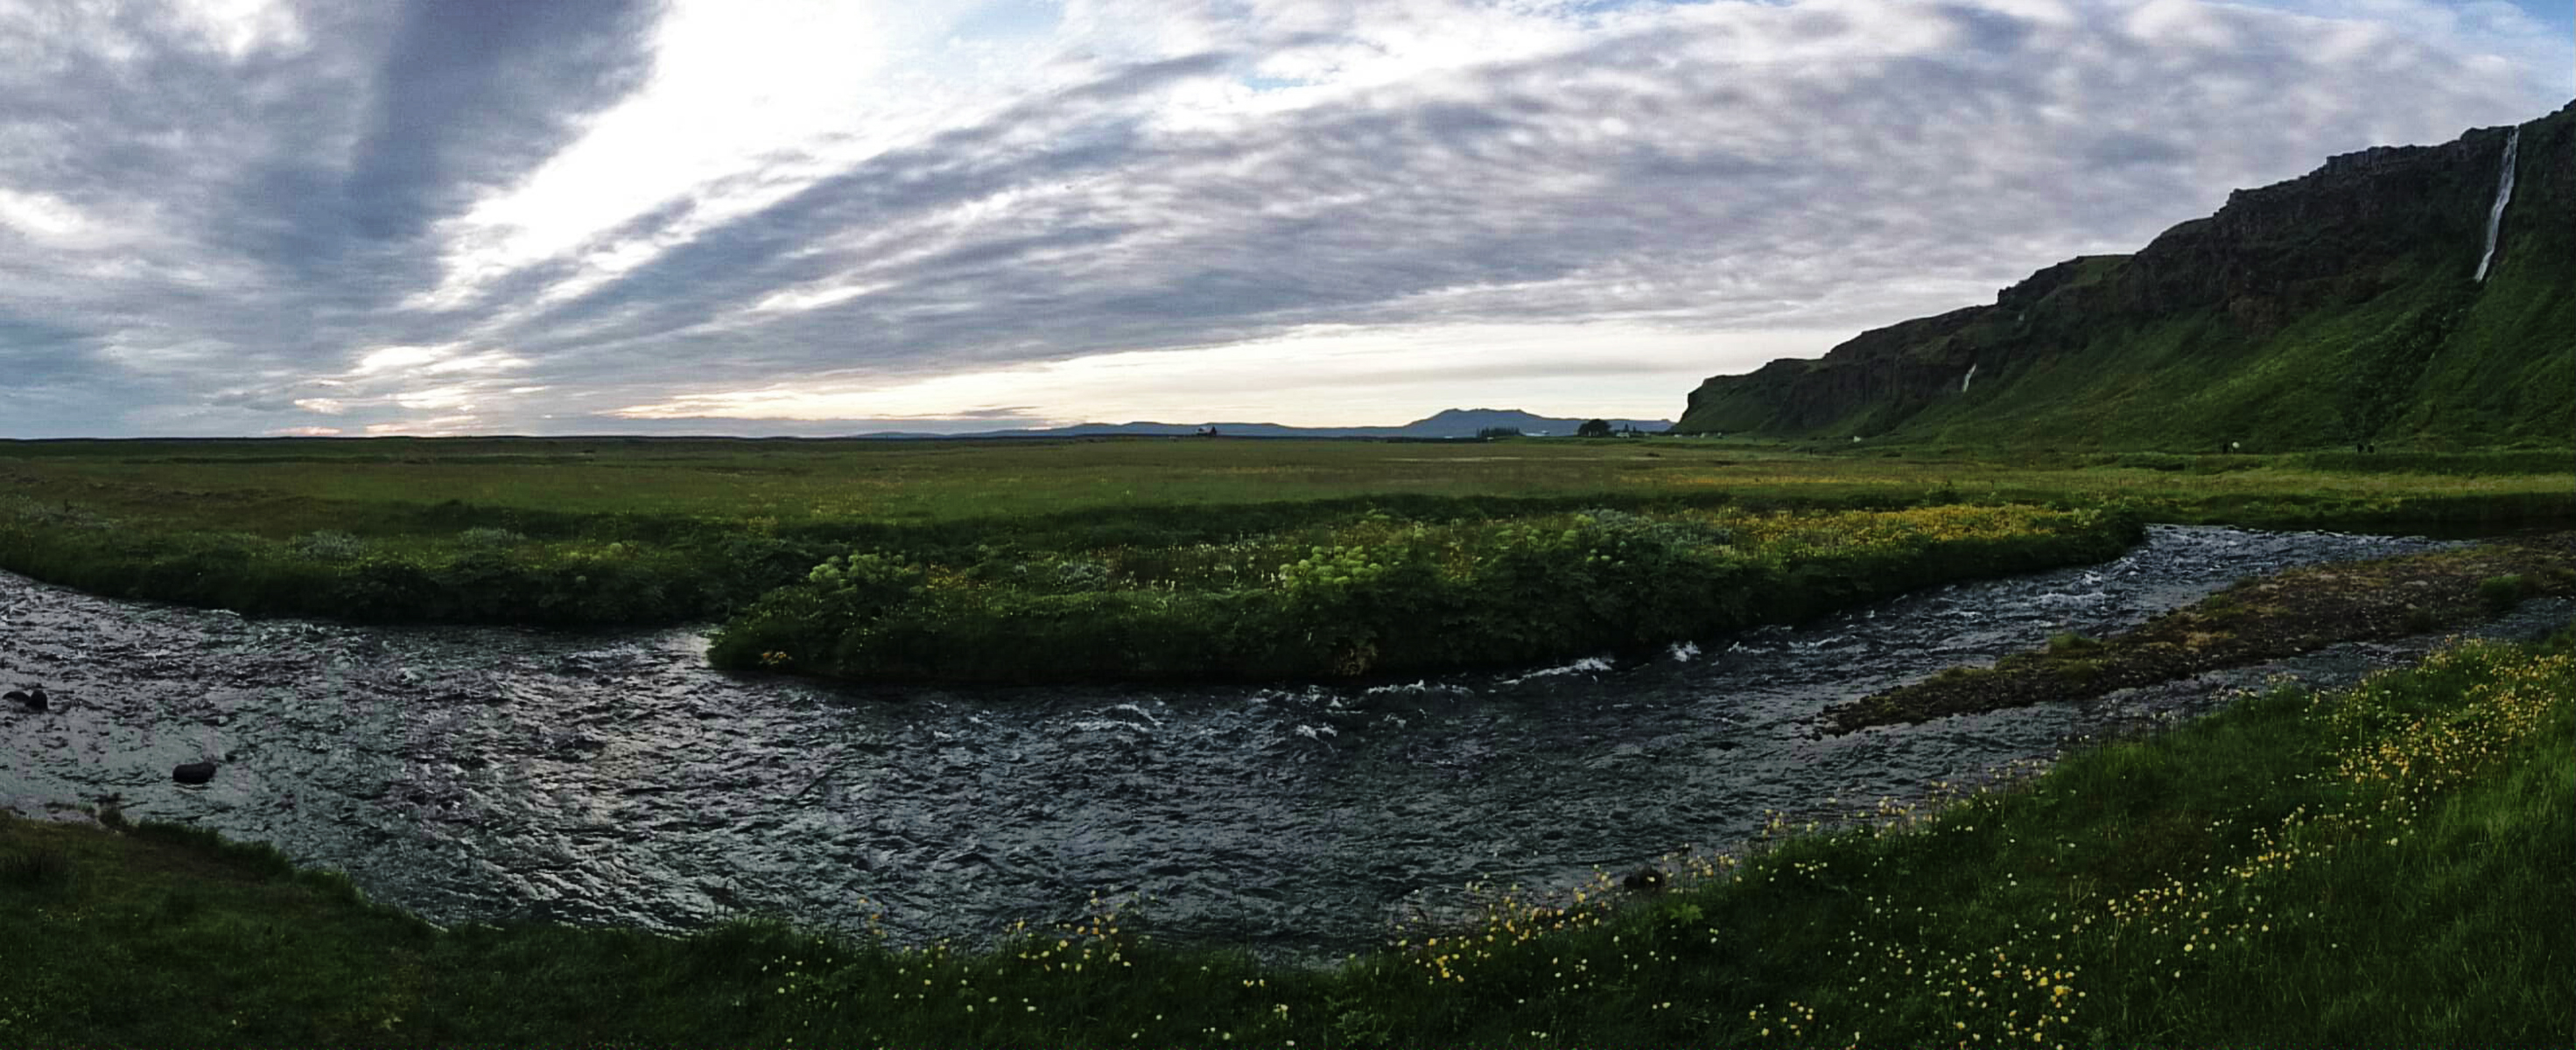 16. Seljalandsfoss